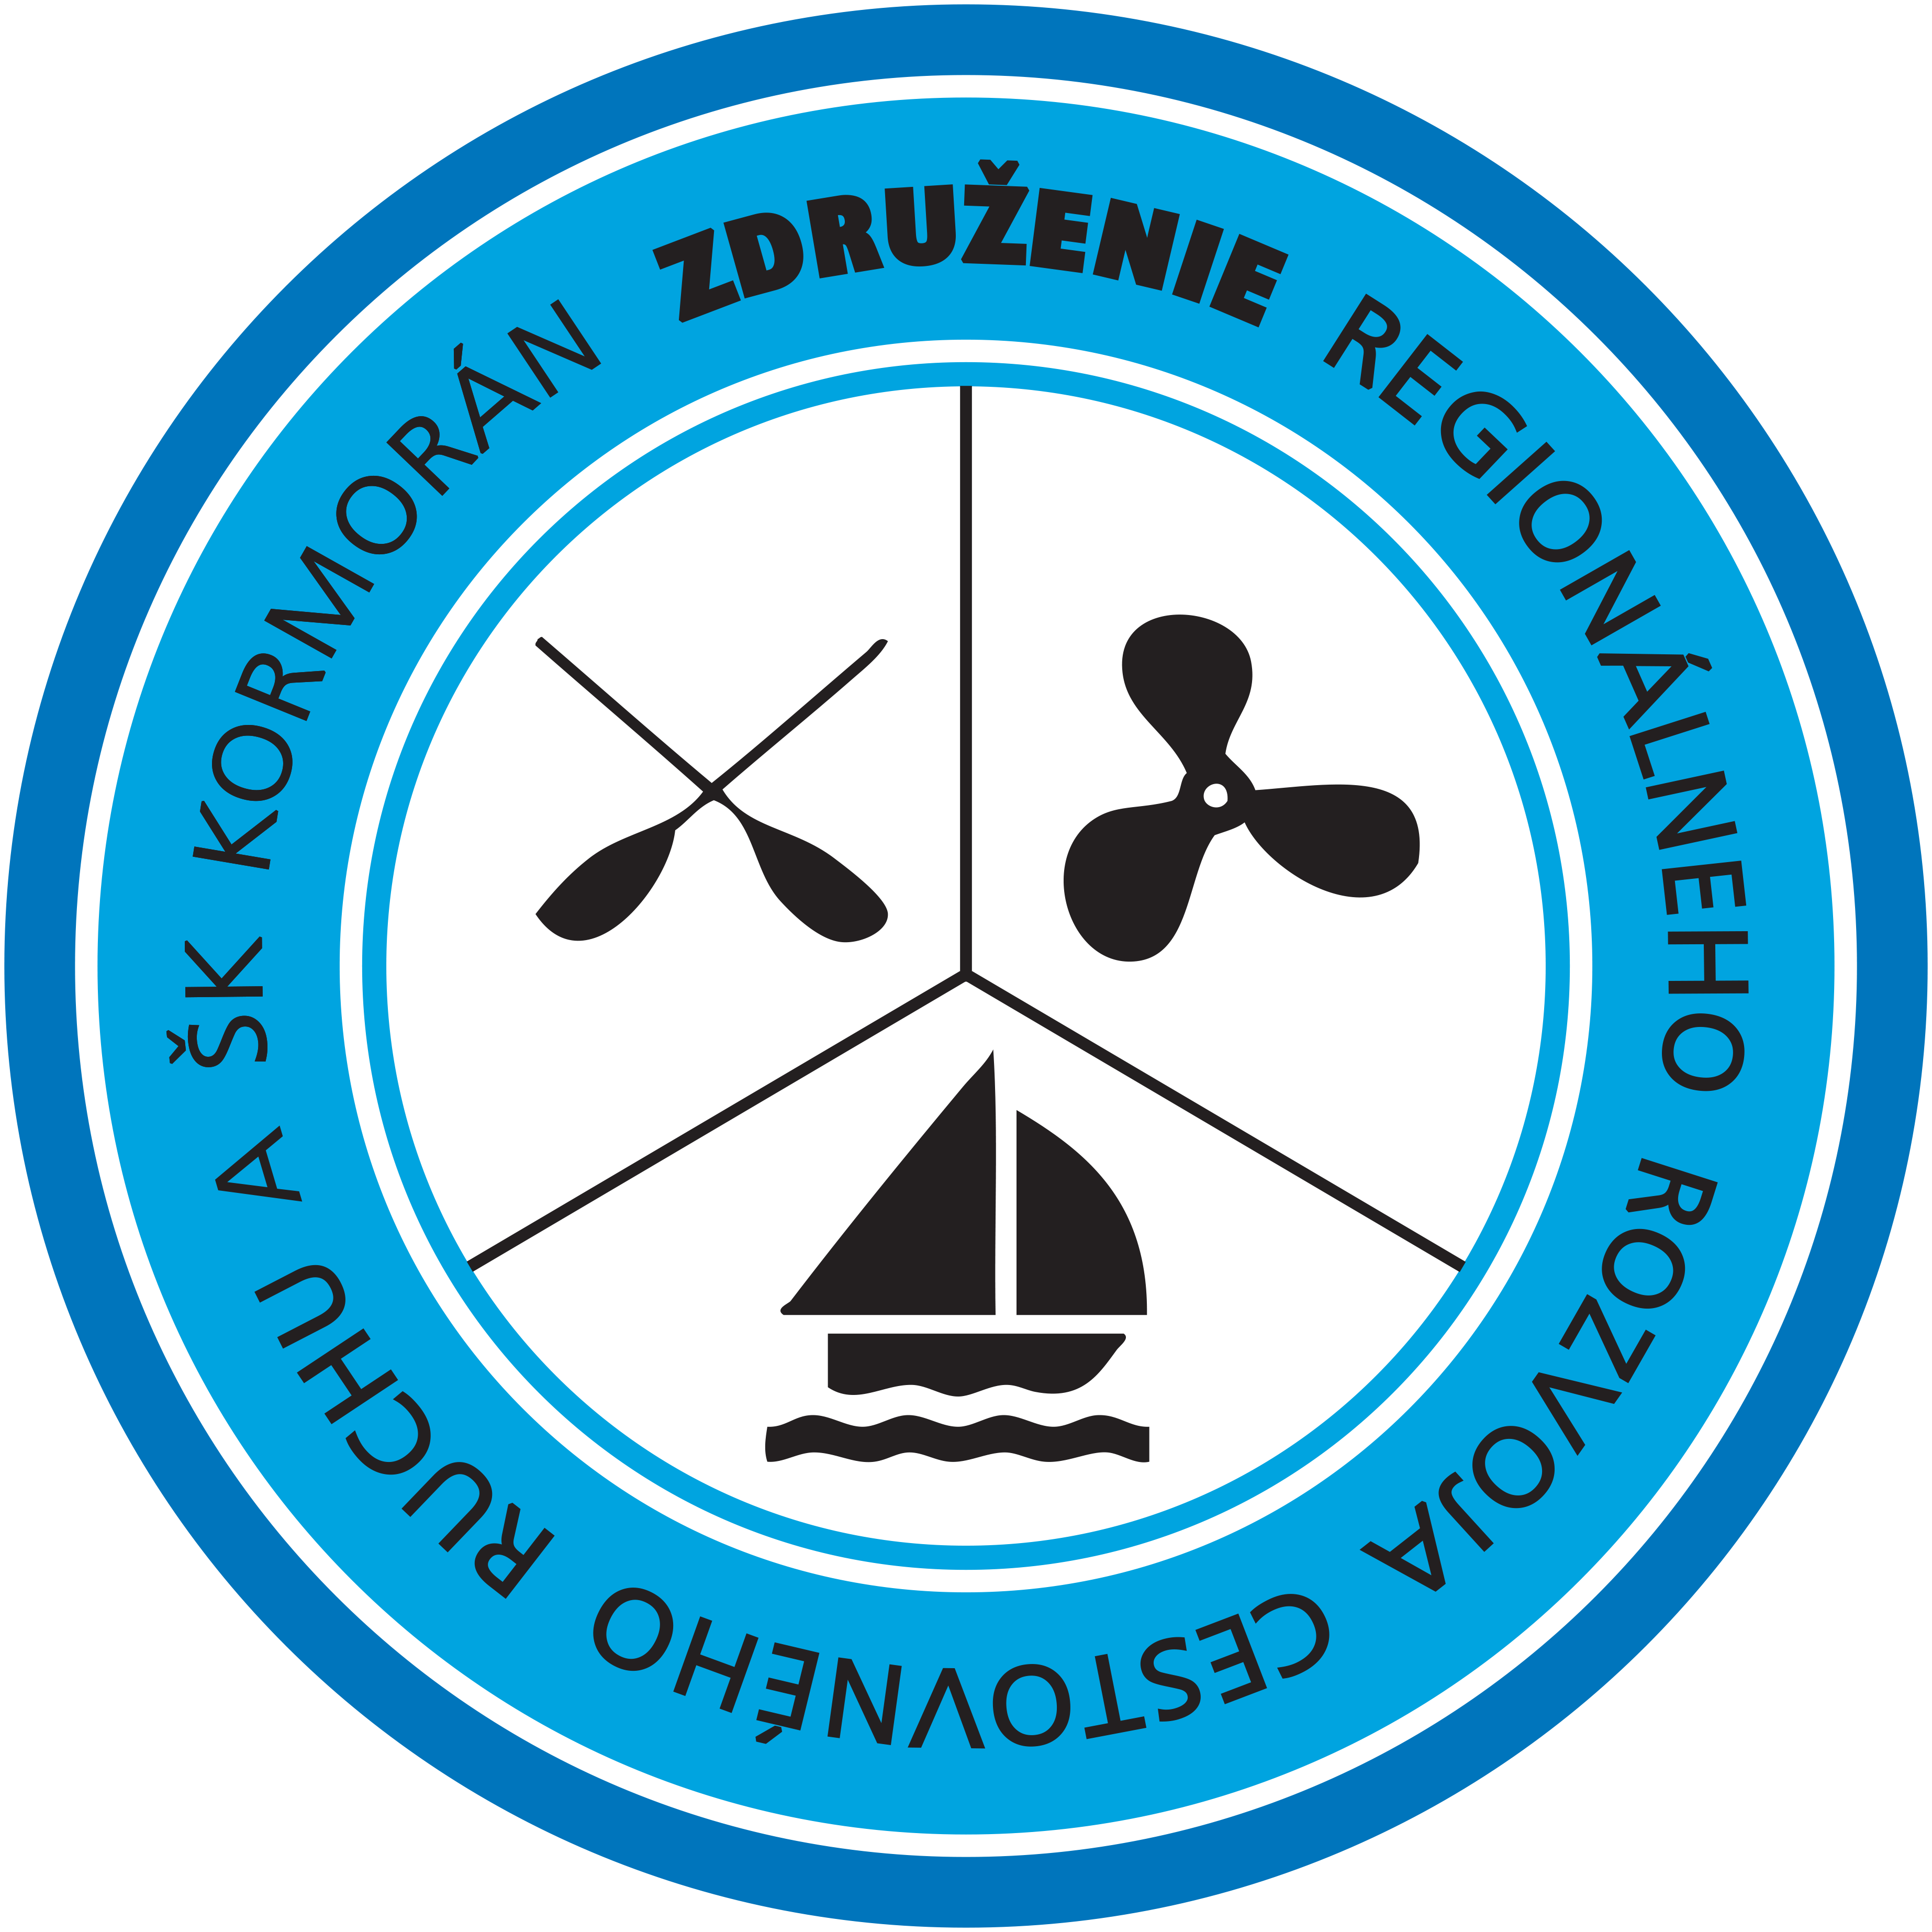 logo združenia regio